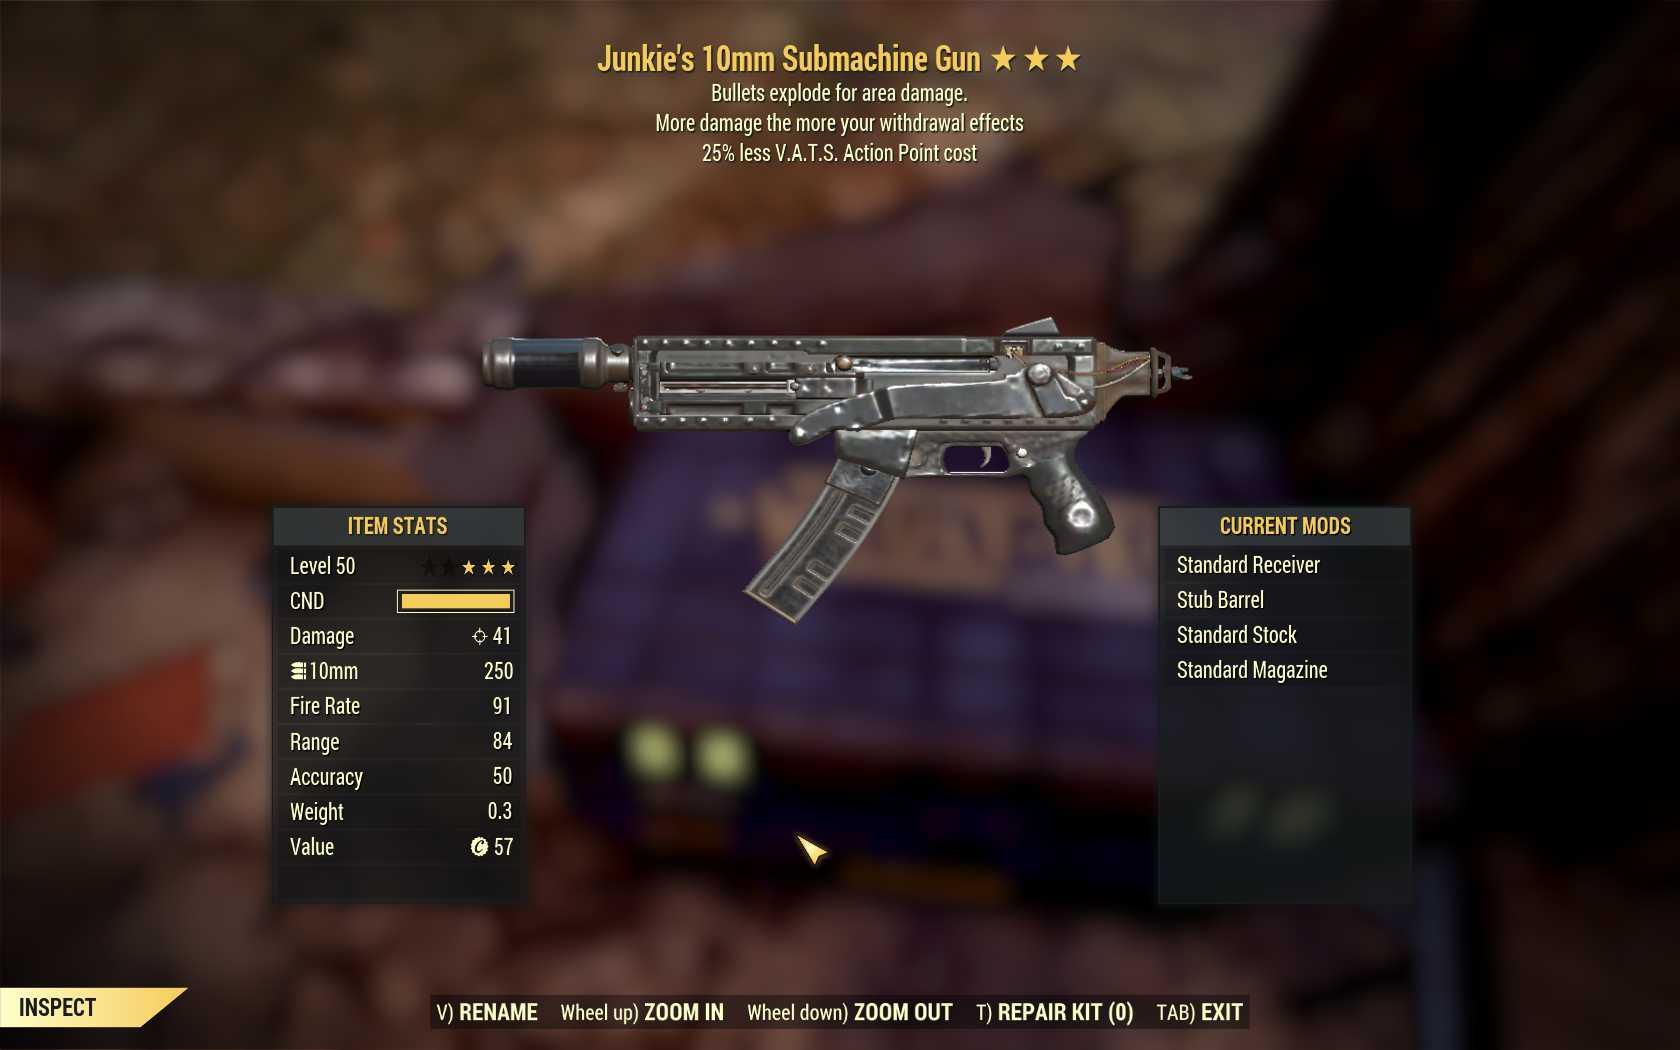 [3 Stars]Junkie's+Explosive 10mm Submachine Gun+25% less VATS AP cost)